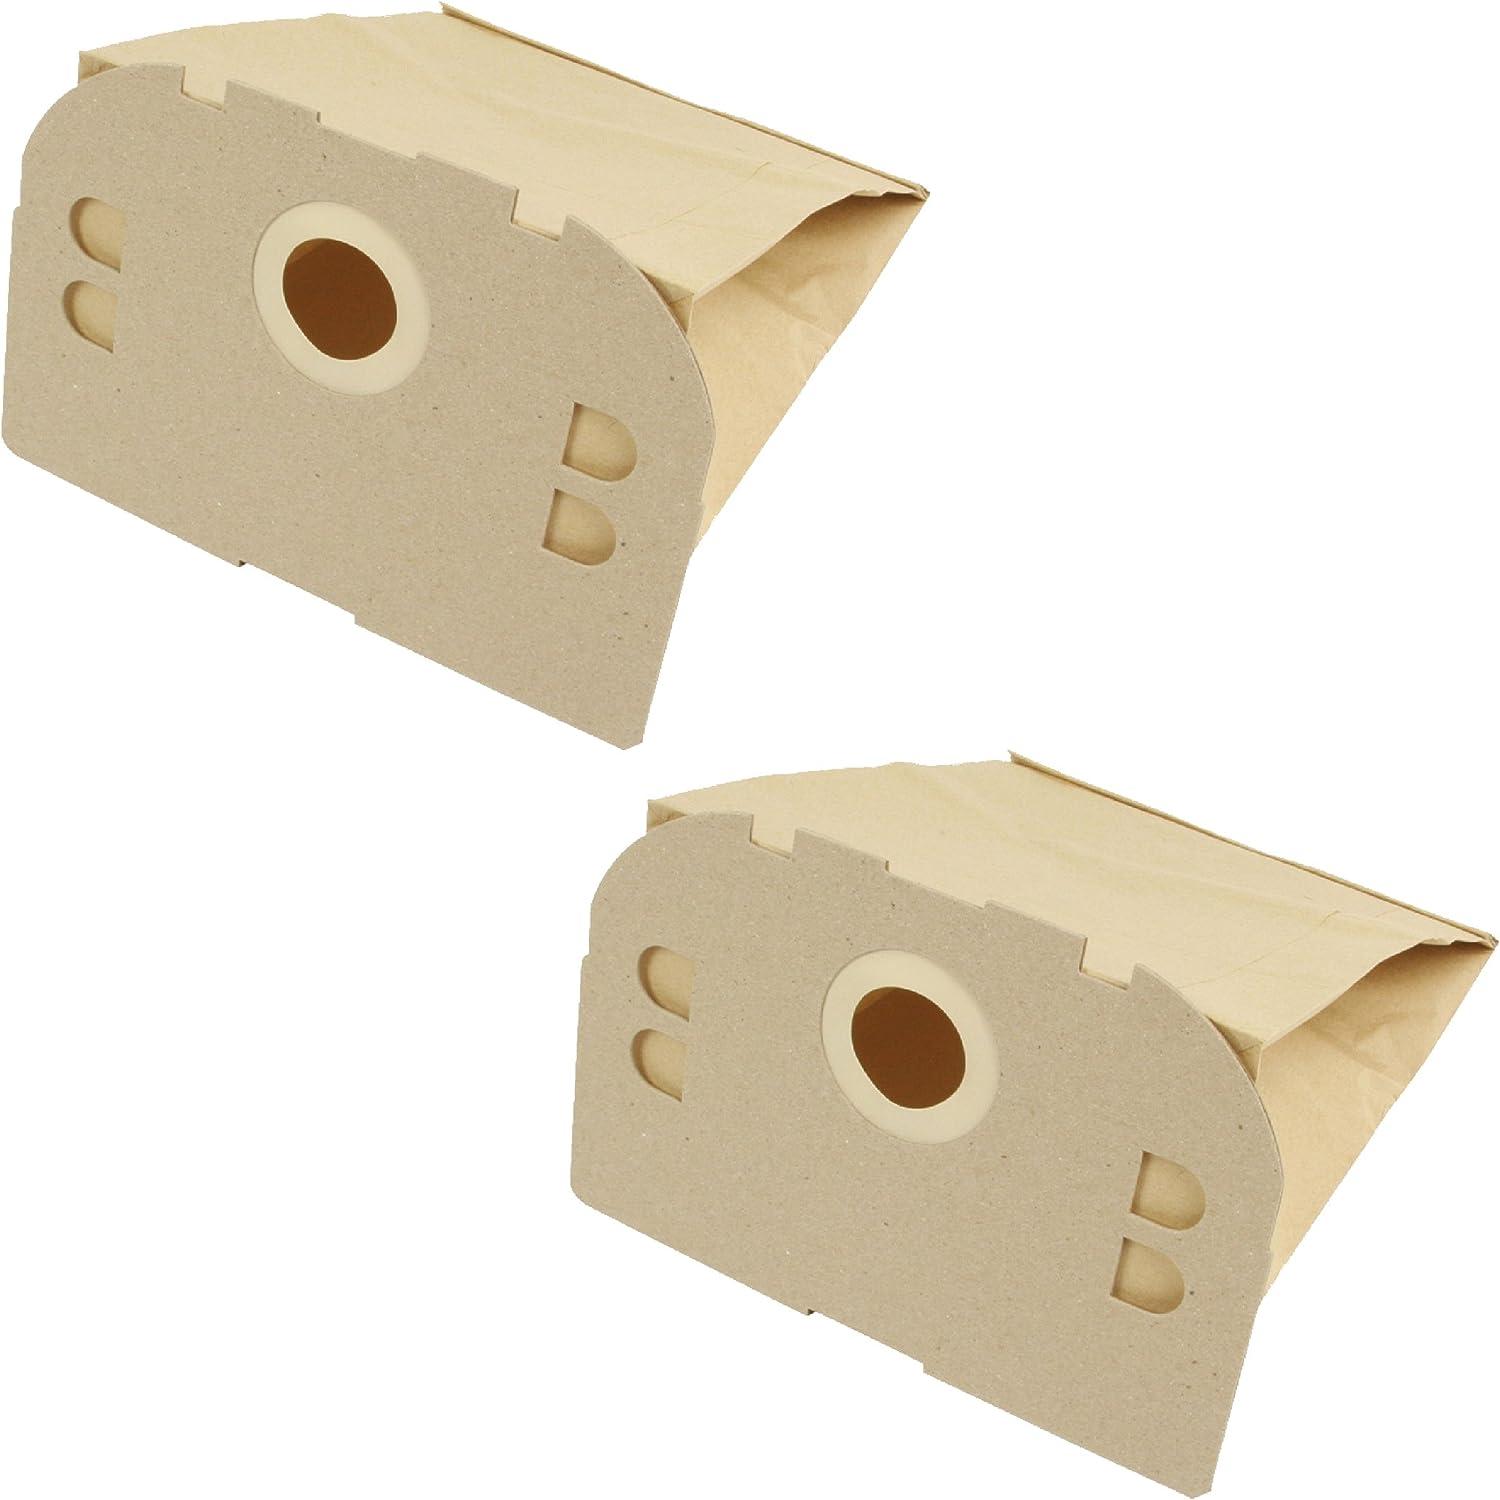 20 Bolsas de papel Bolsas para aspiradora Vorwerk Tiger VK 250 VK 251 252 by One. All by One.®.: Amazon.es: Hogar